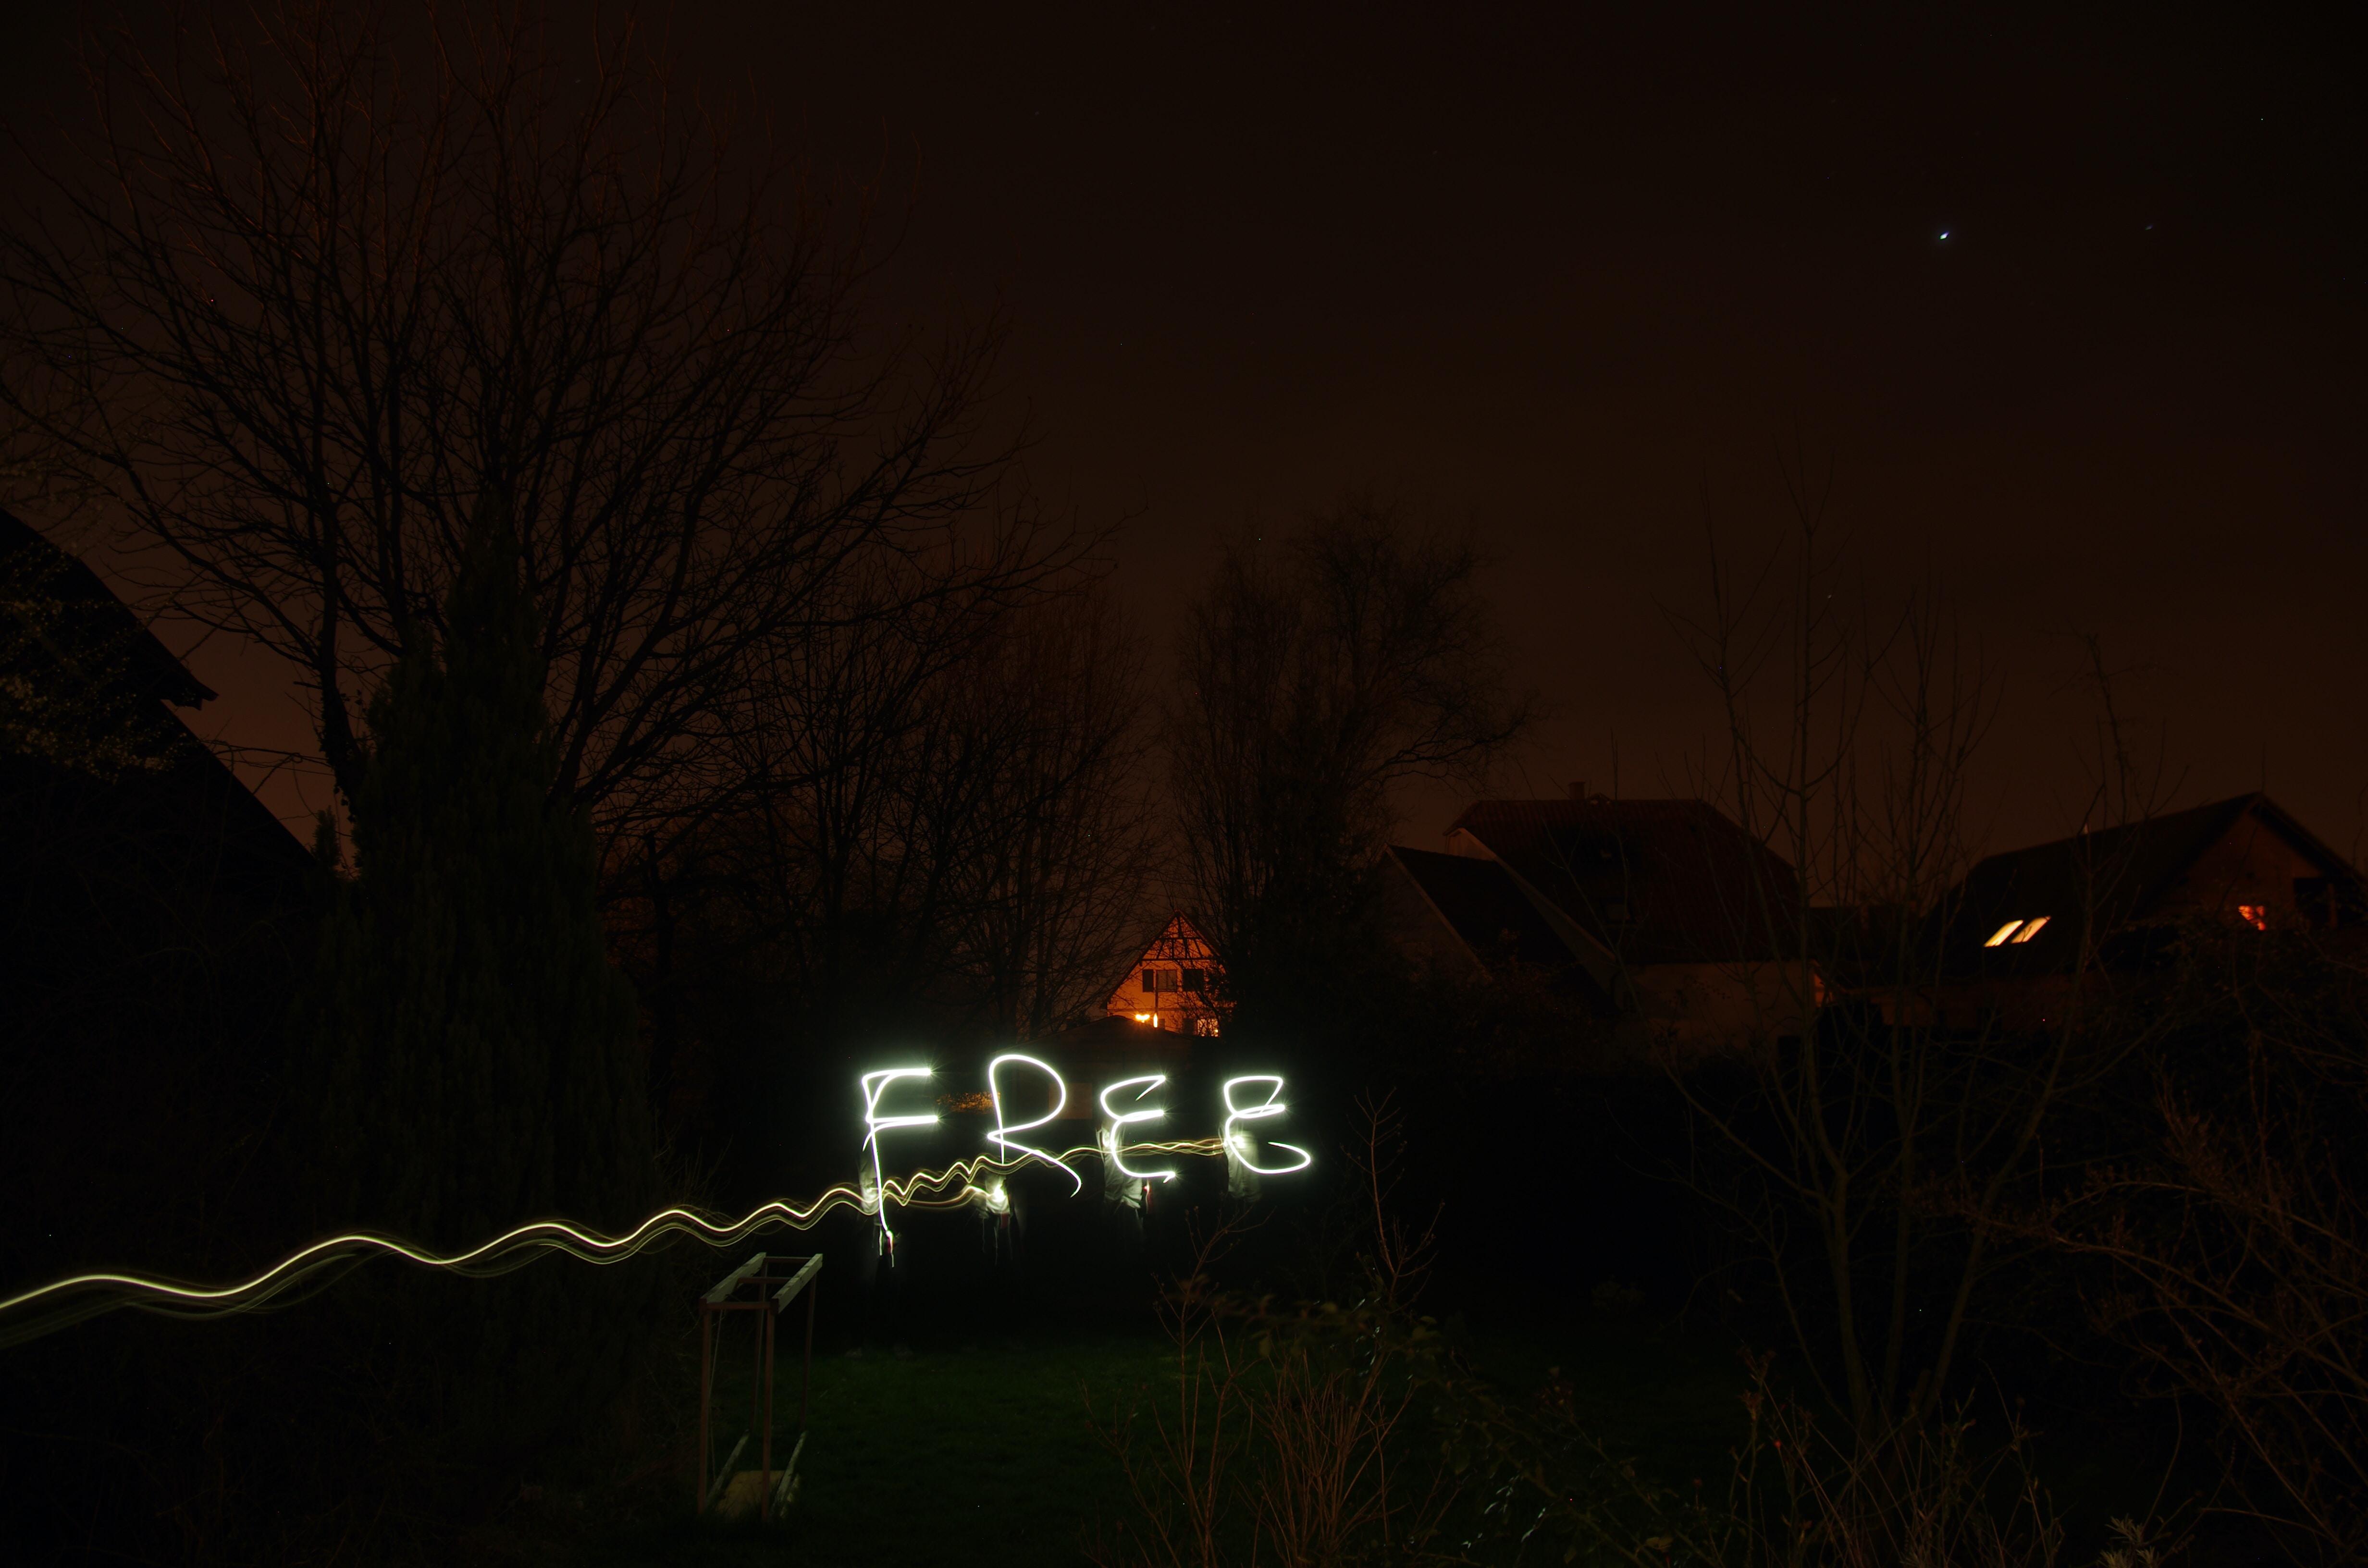 Free neon signage